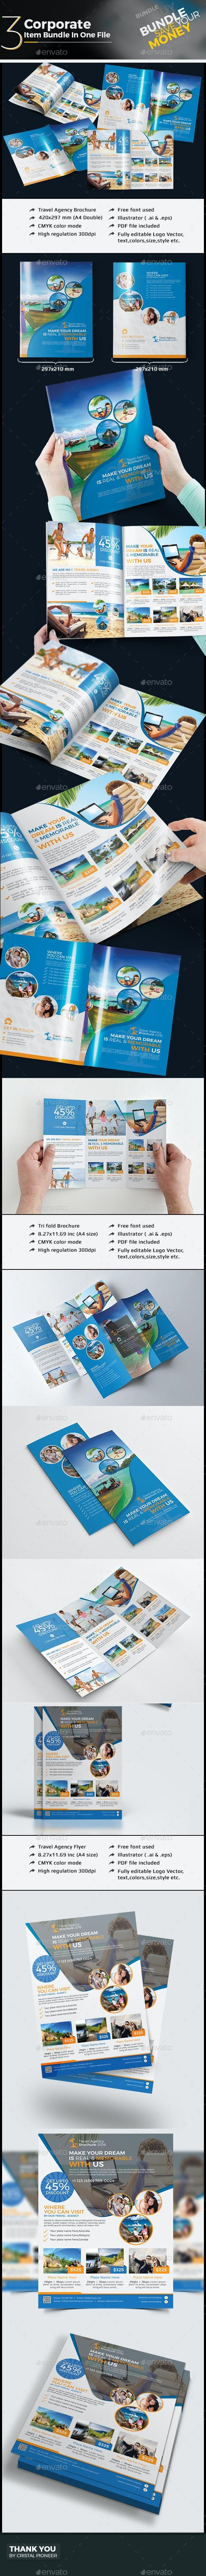 Travel Agency Branding Bundle - Corporate Brochures